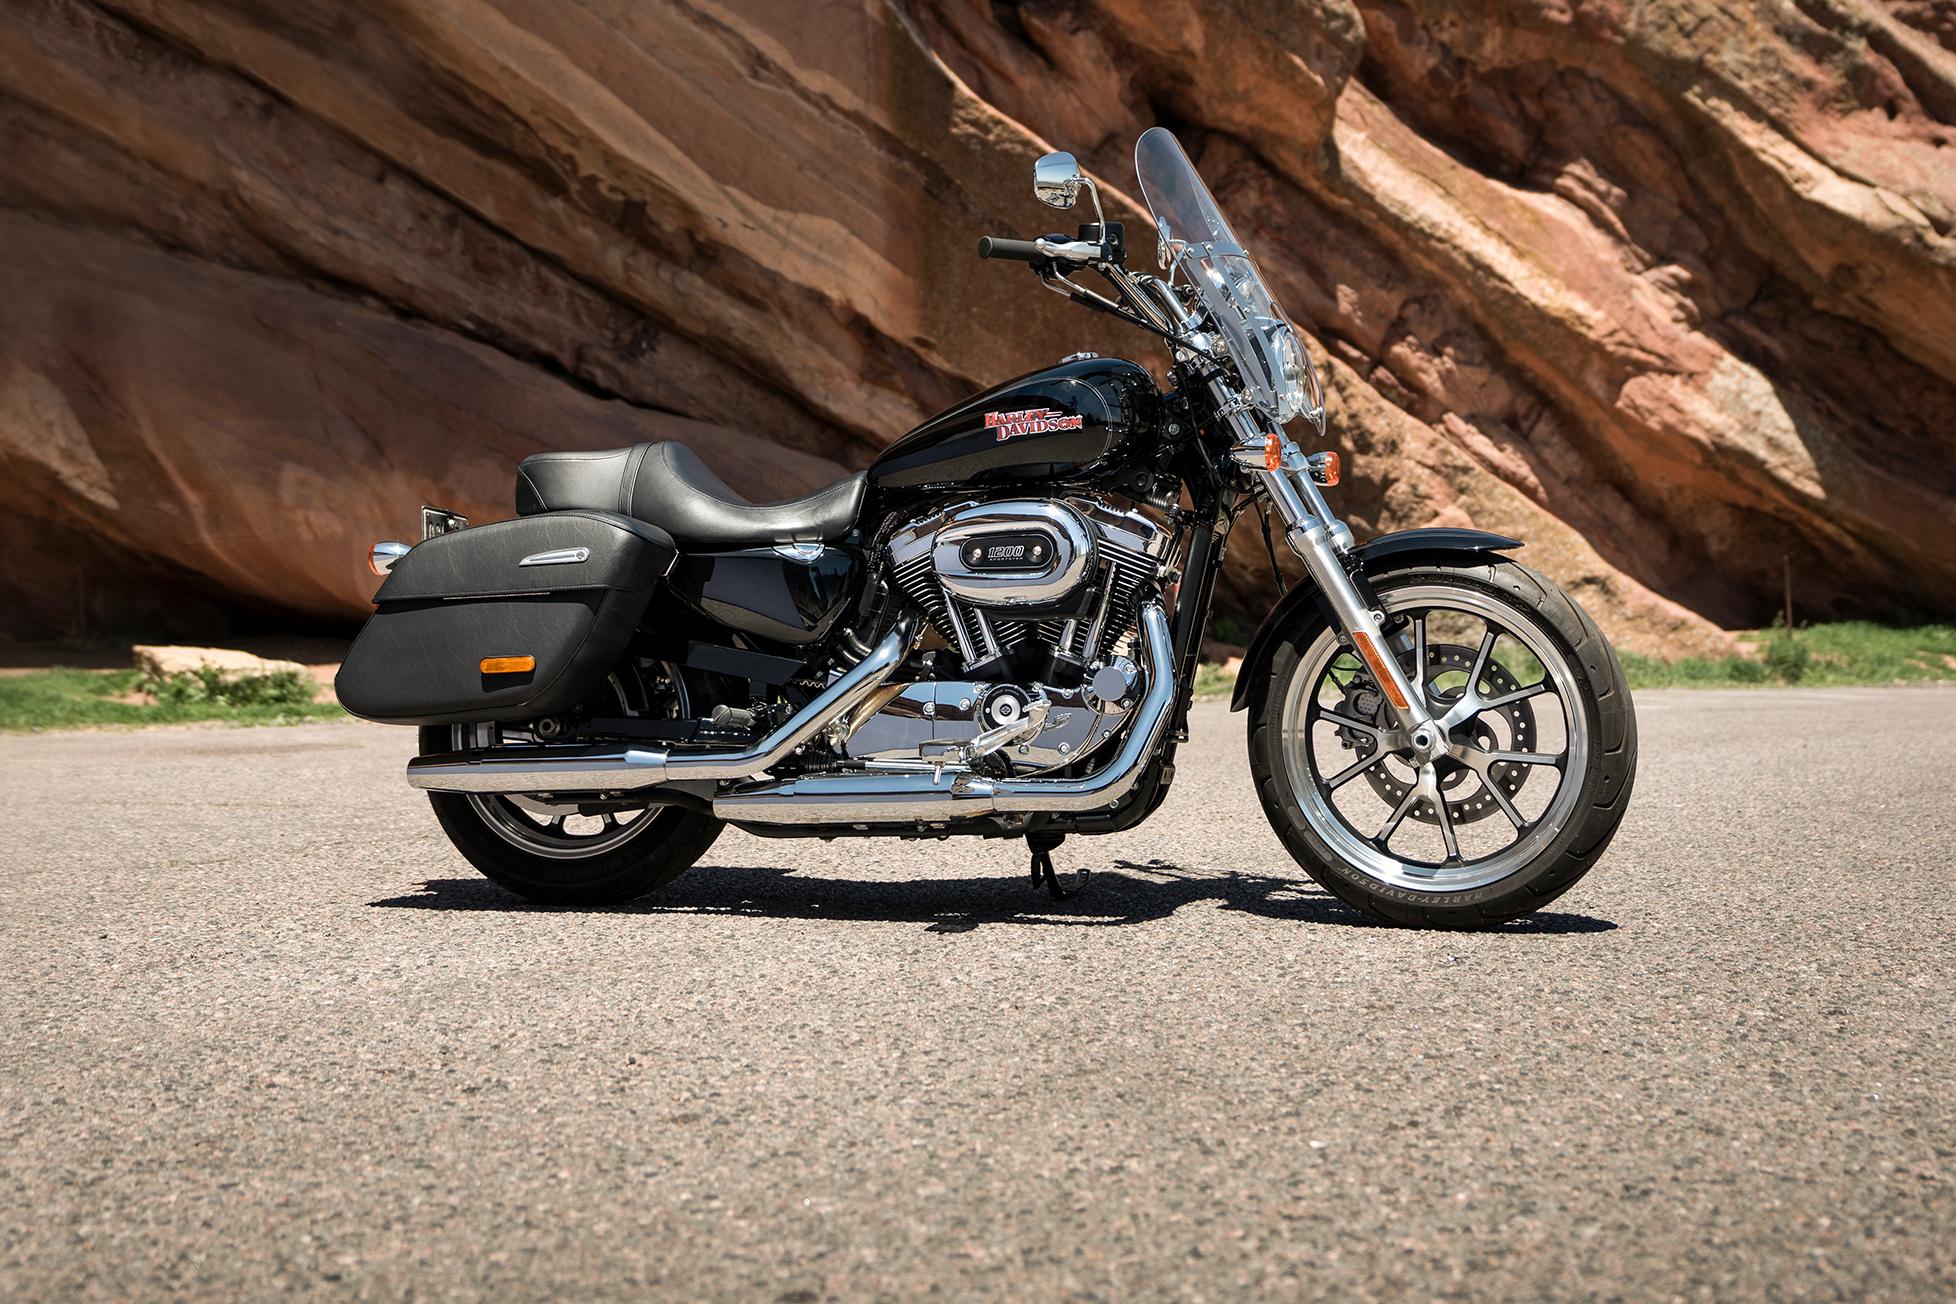 2019 SuperLow 1200T Motorcycle   Harley-Davidson International